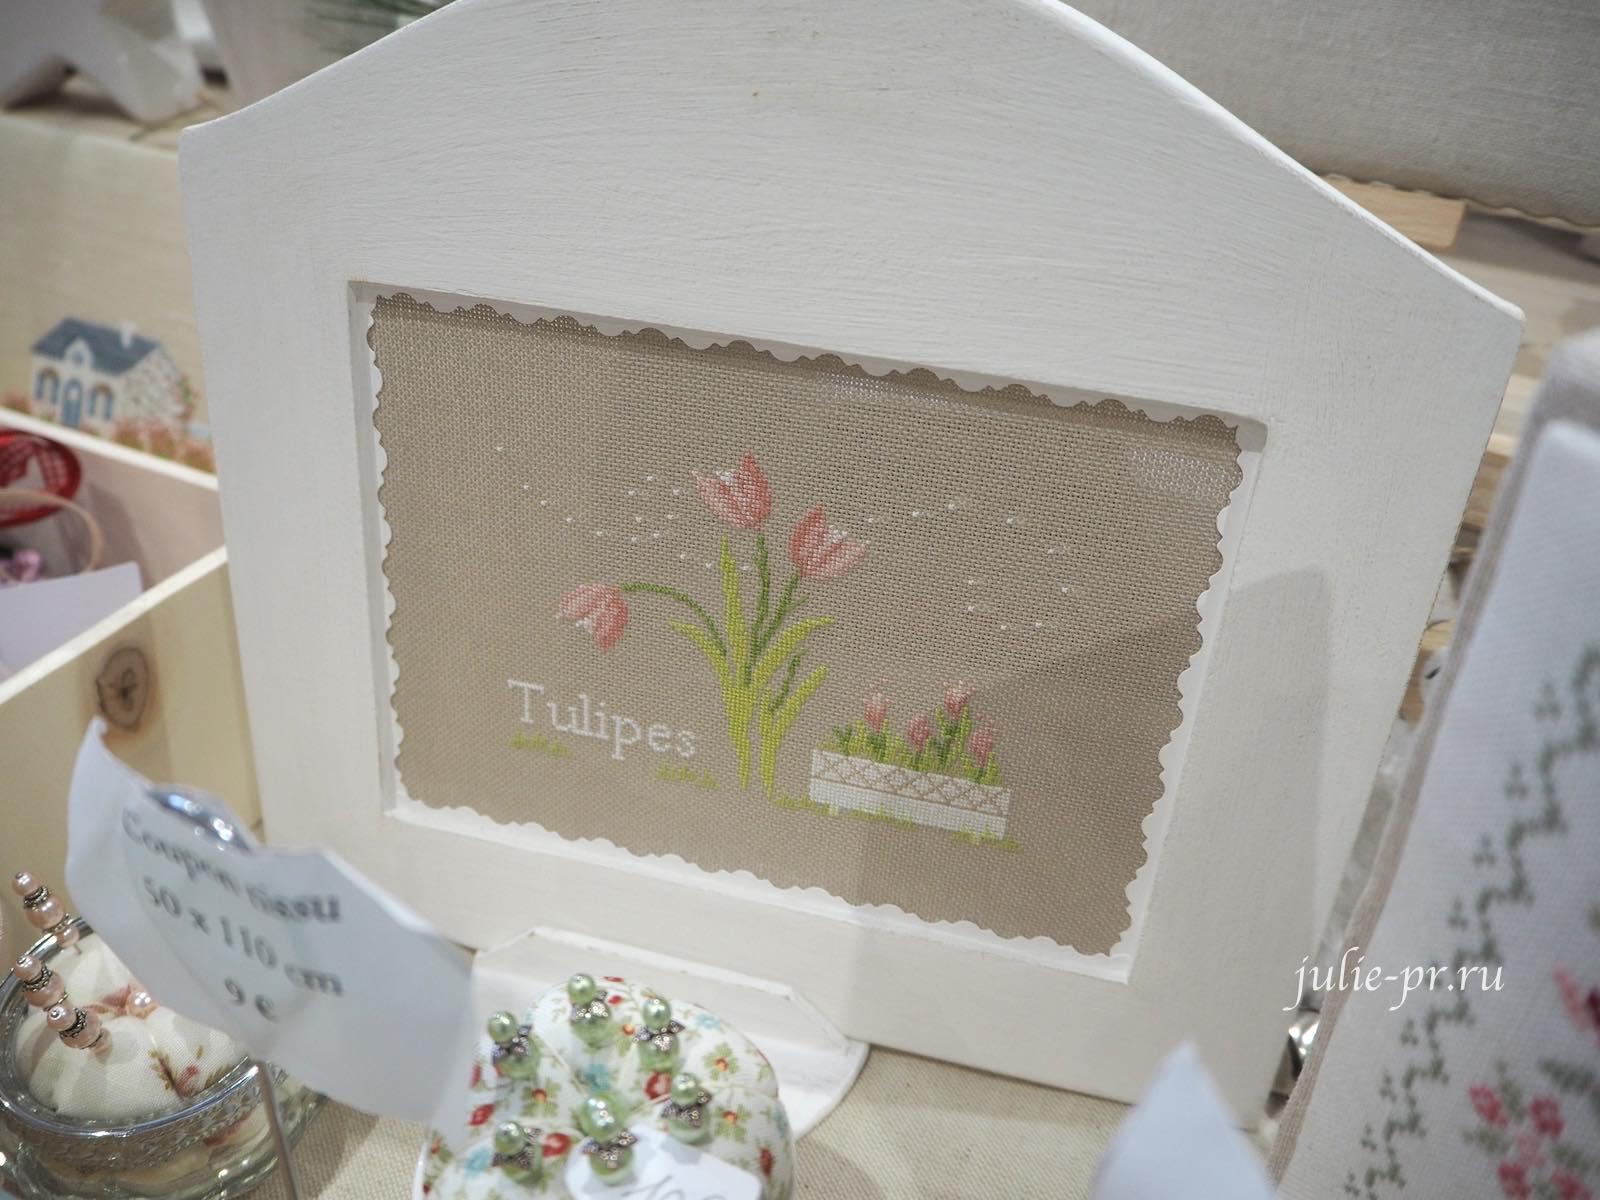 Jennifer Lentini, Tulipes, тюльпаны, вышивка крестом